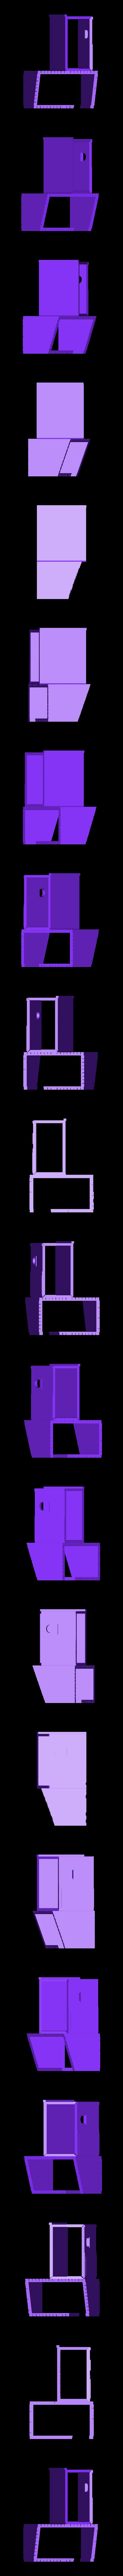 bl_c_001.stl Download free STL file Saxon Burh Market • 3D printable object, Earsling